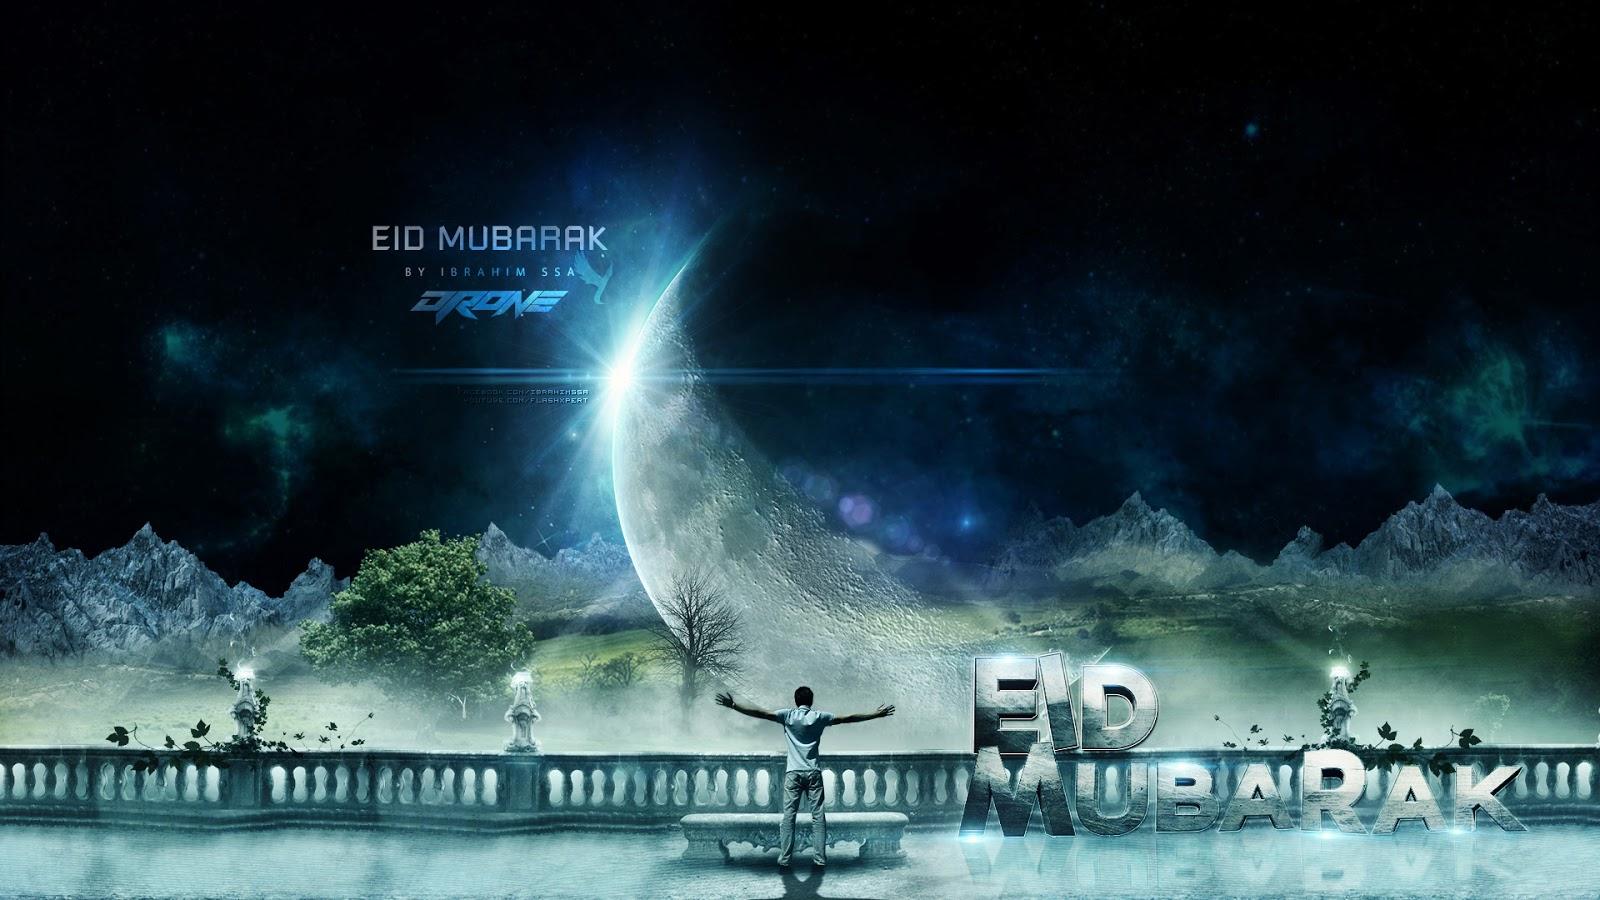 Hd wallpaper eid mubarak - Eid Mubarak Hd Wallpaper Pictures For Family 2